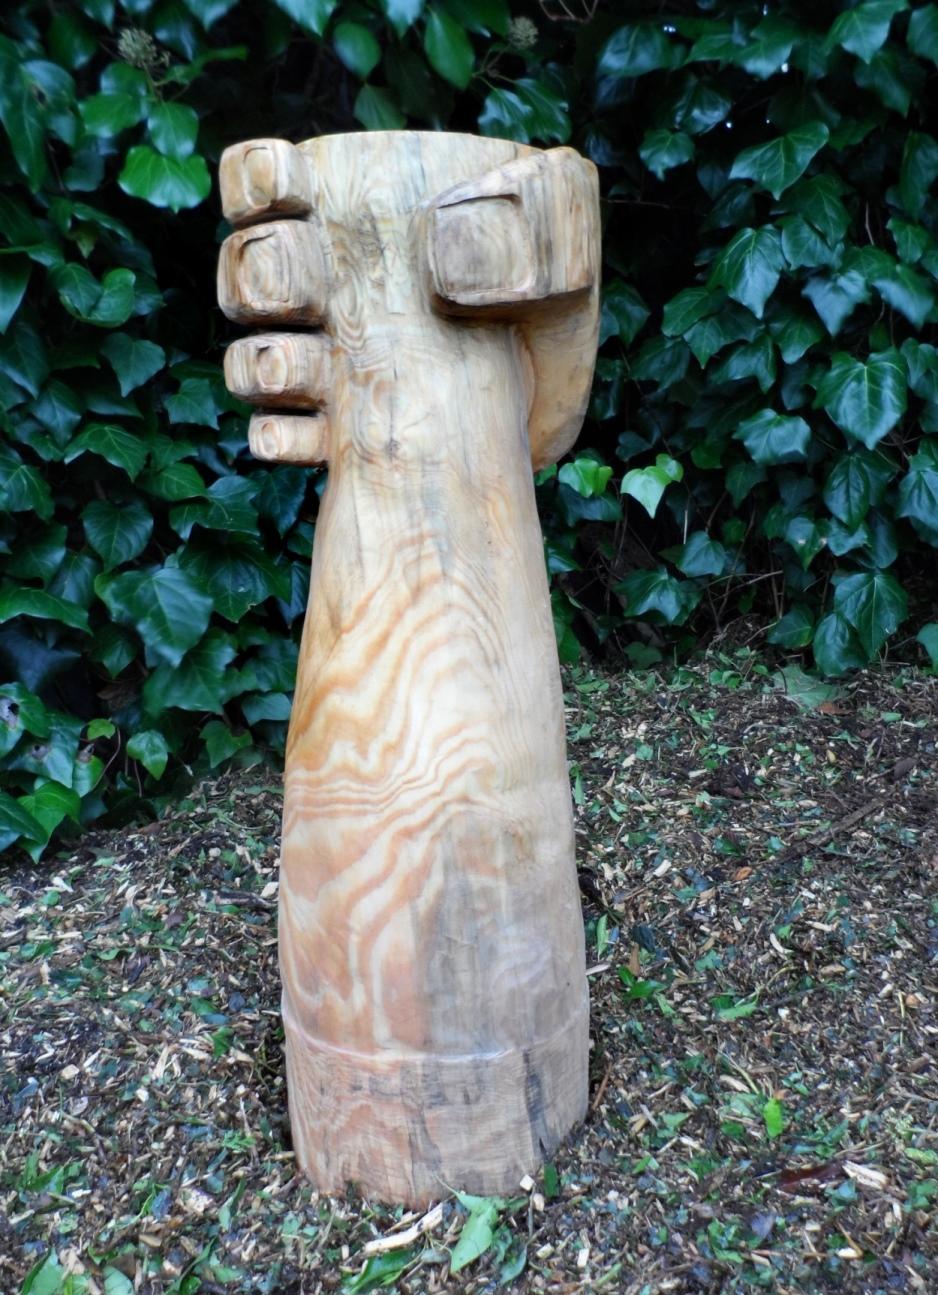 002 Hand (1).JPG